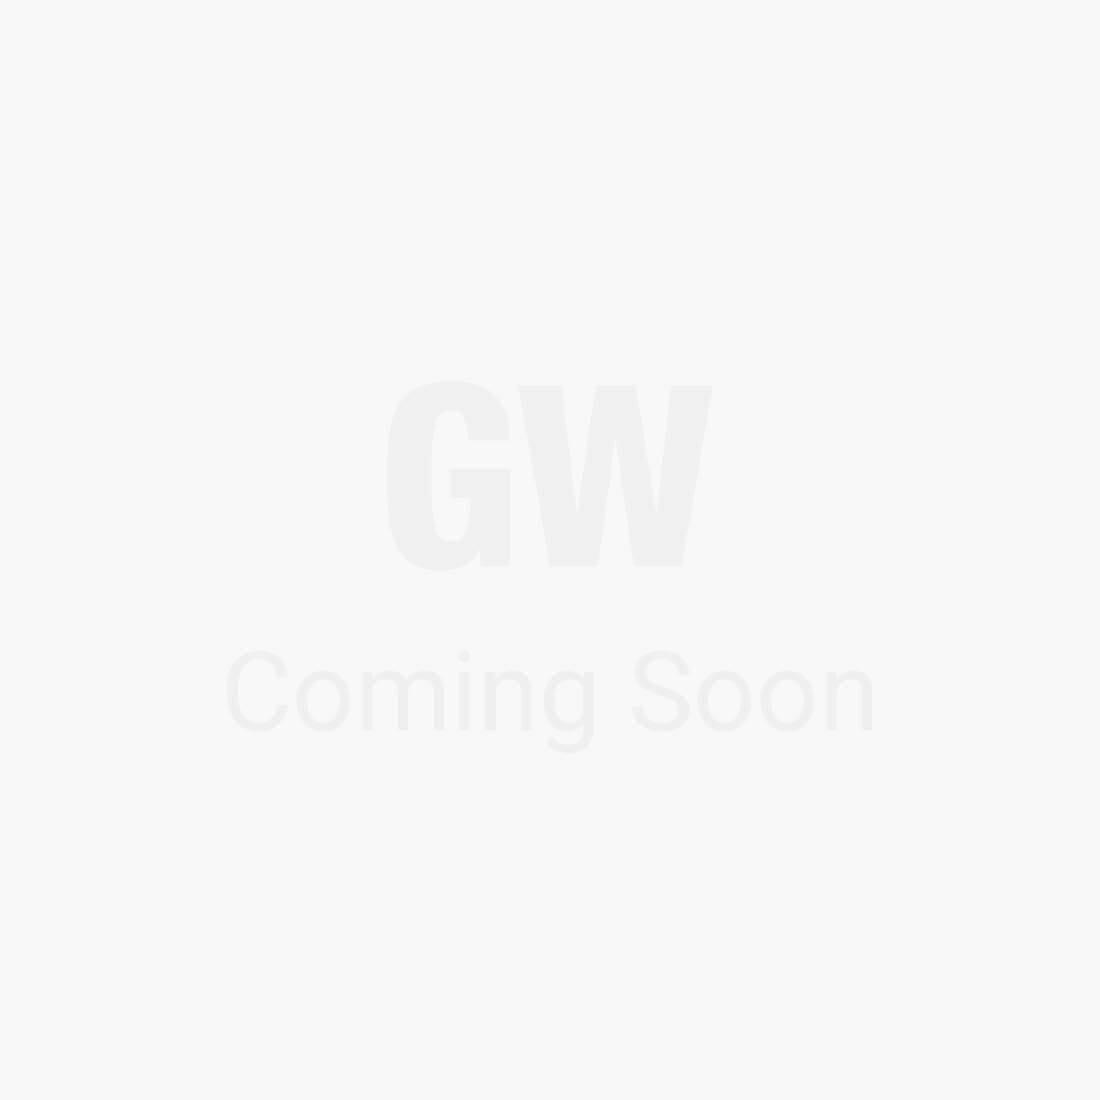 Sensational Occasional Chairs Leather Outdoor Designer Globewest Frankydiablos Diy Chair Ideas Frankydiabloscom